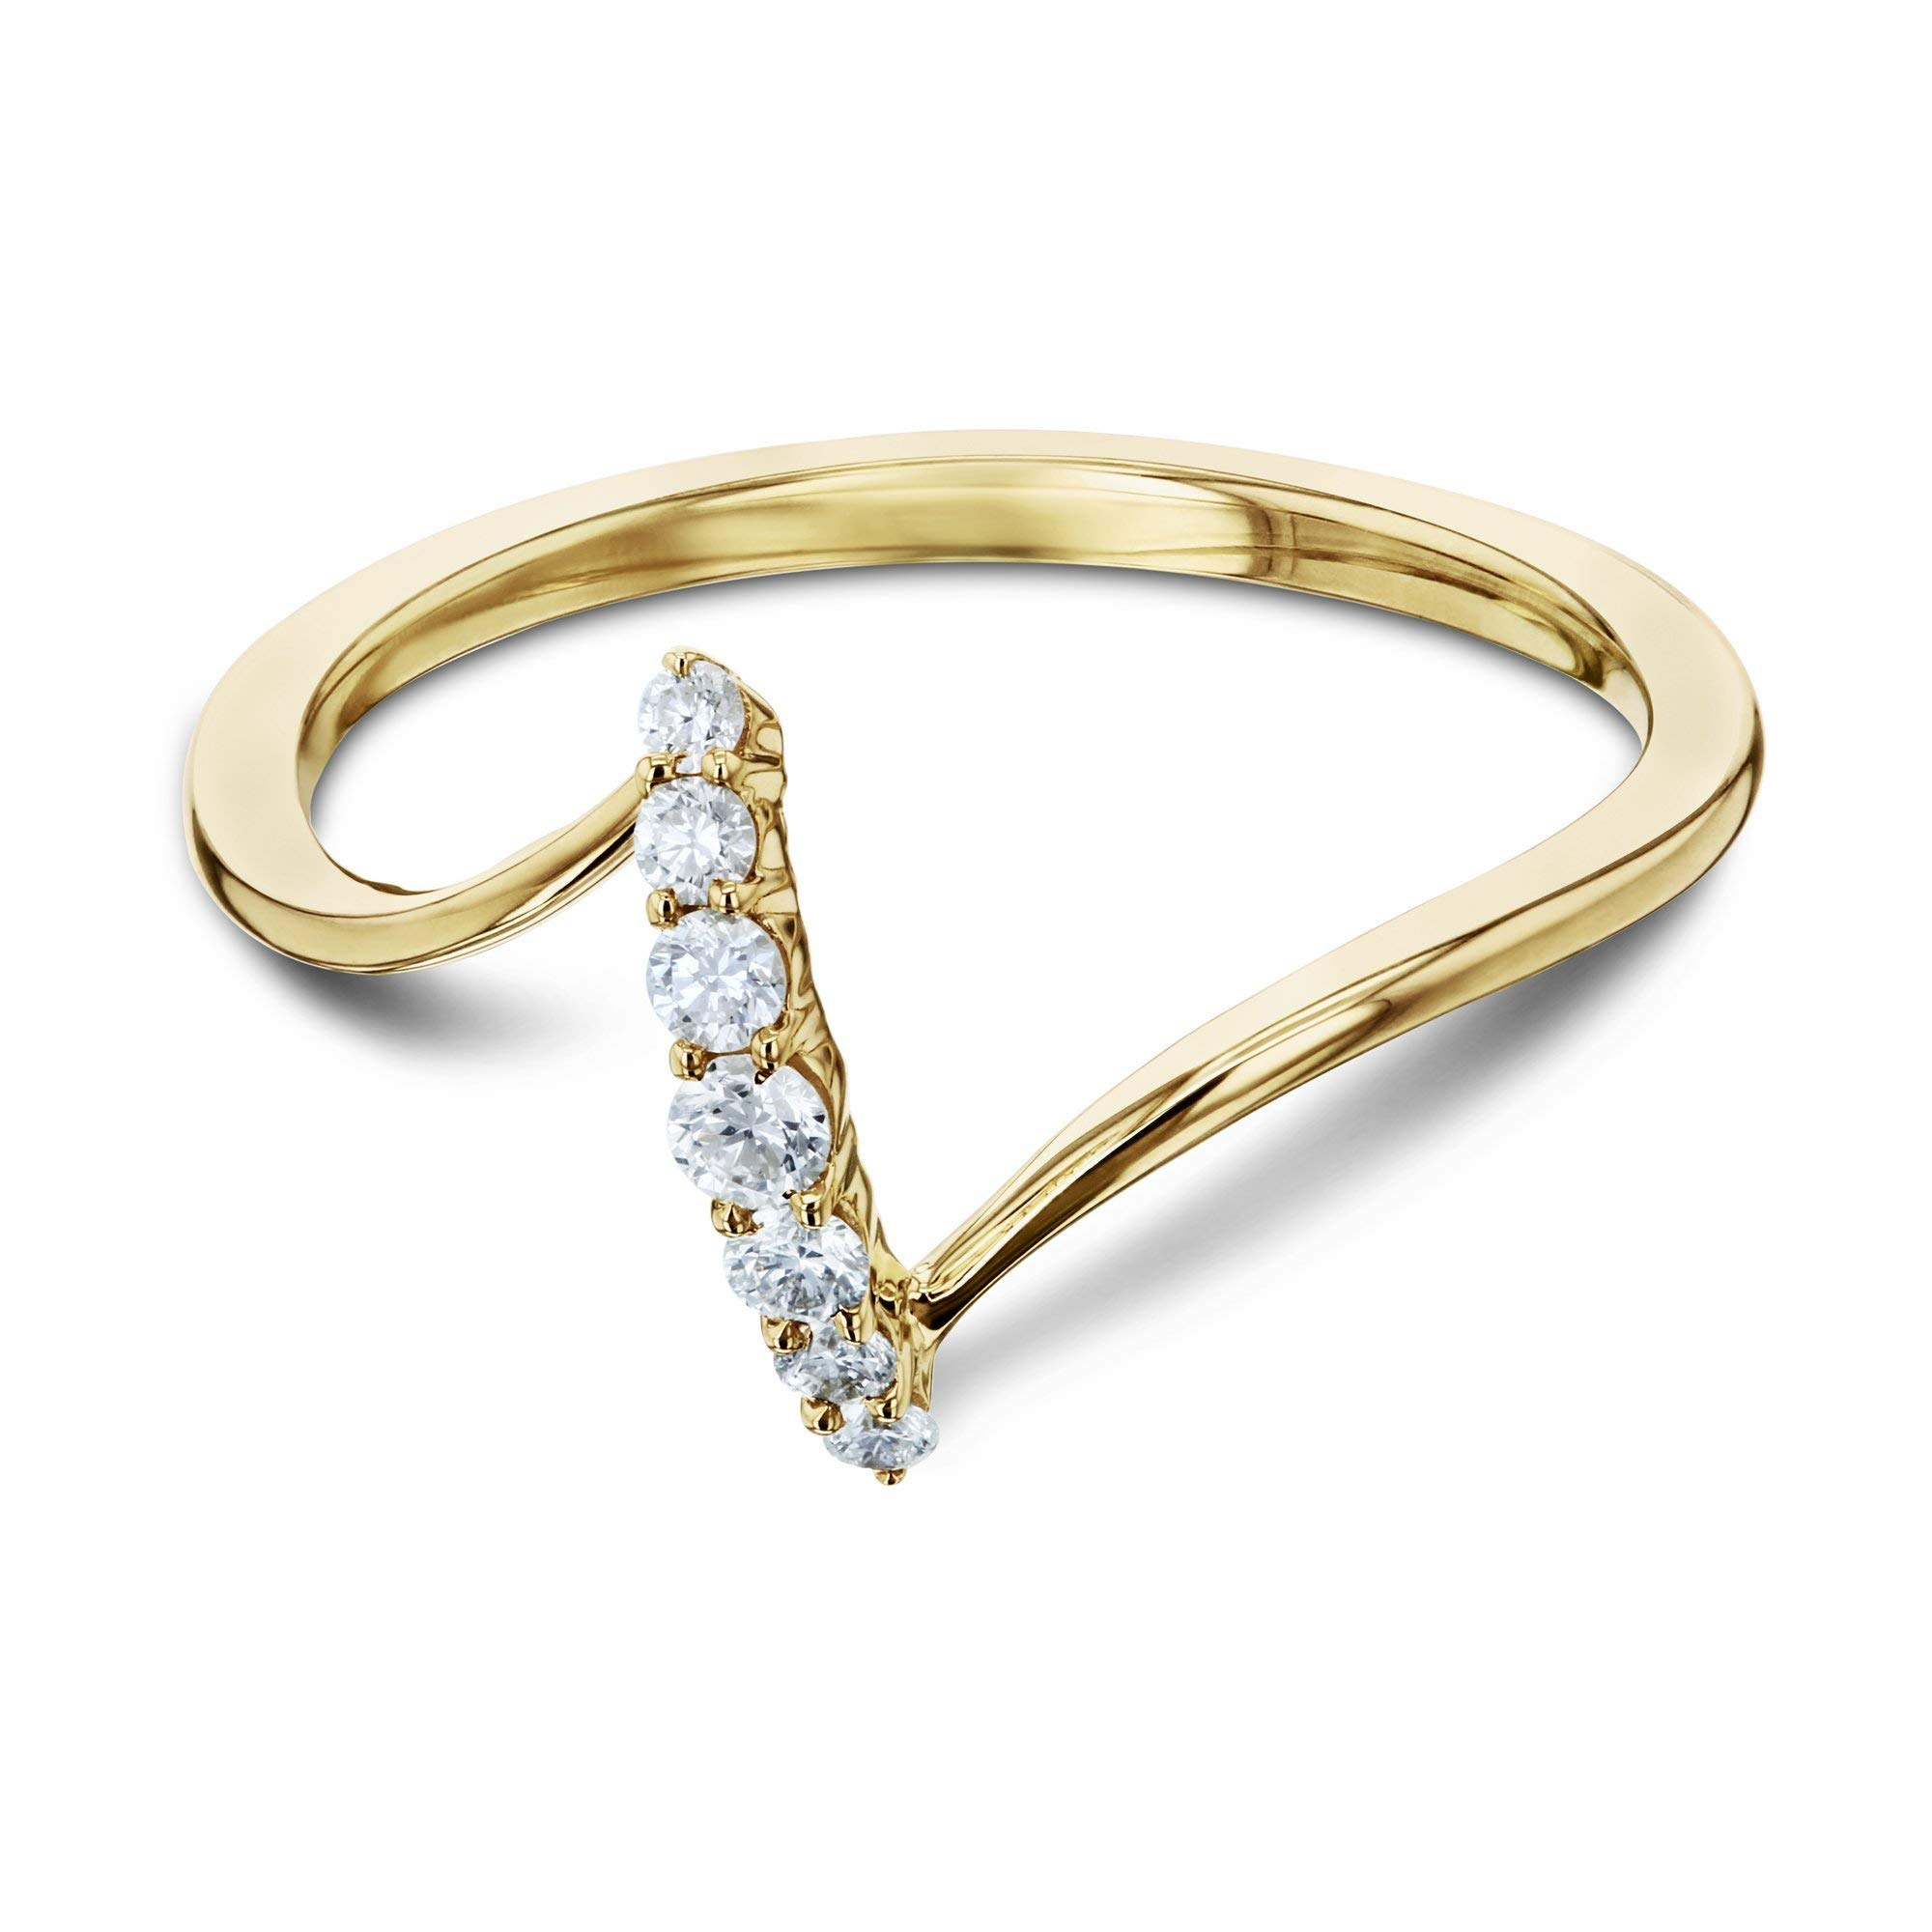 Diamond Z Shaped Gold Ring, 6